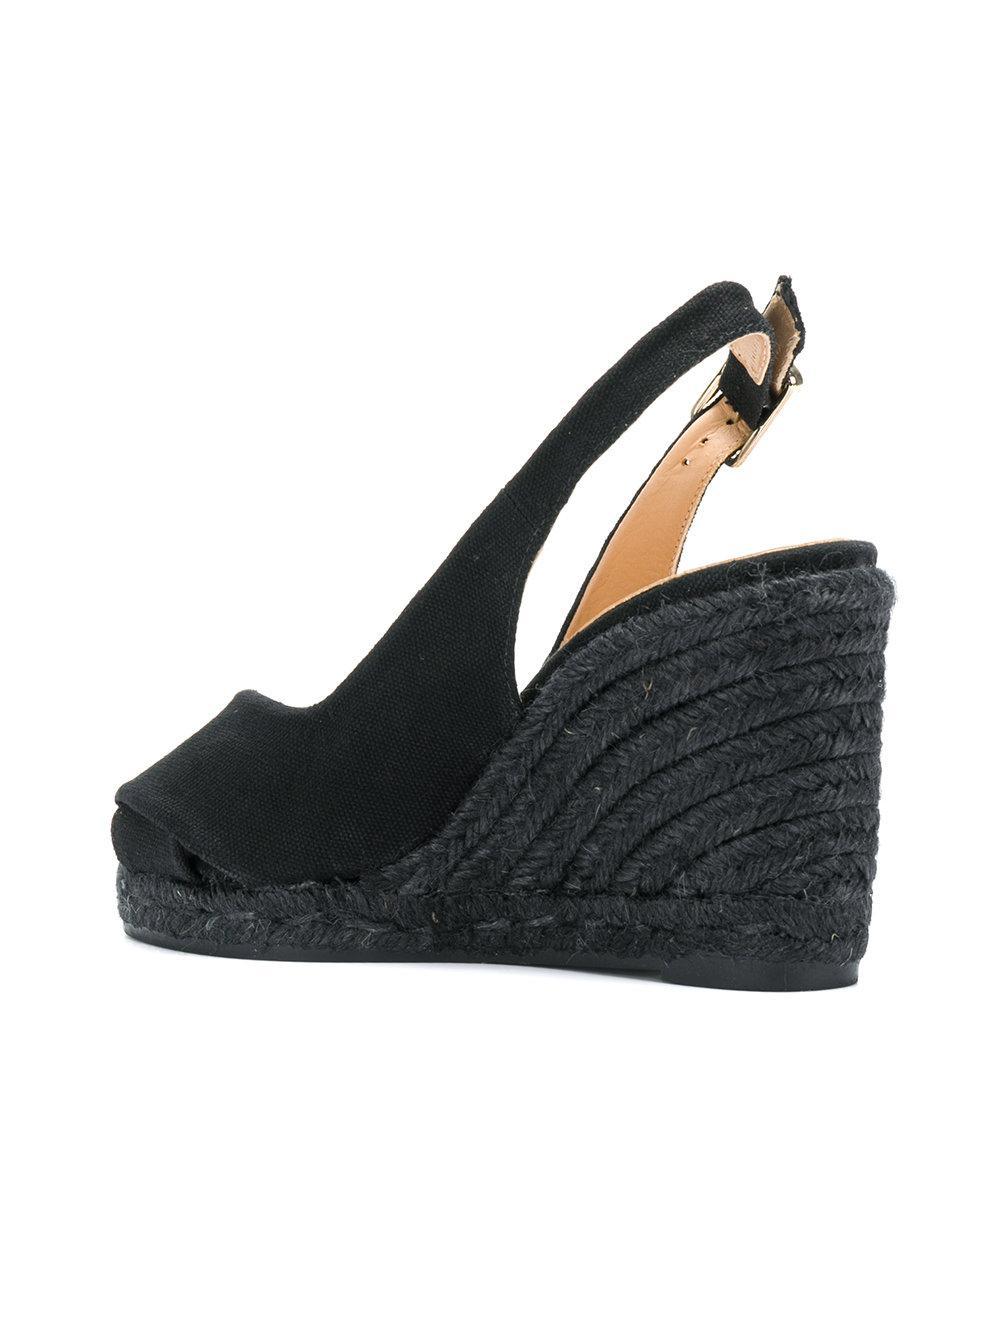 Clearance Hot Sale 2018 Newest Cheap Online Castaner Slingback platform wedge sandals Wholesale Online Outlet Locations Online SVBnQ